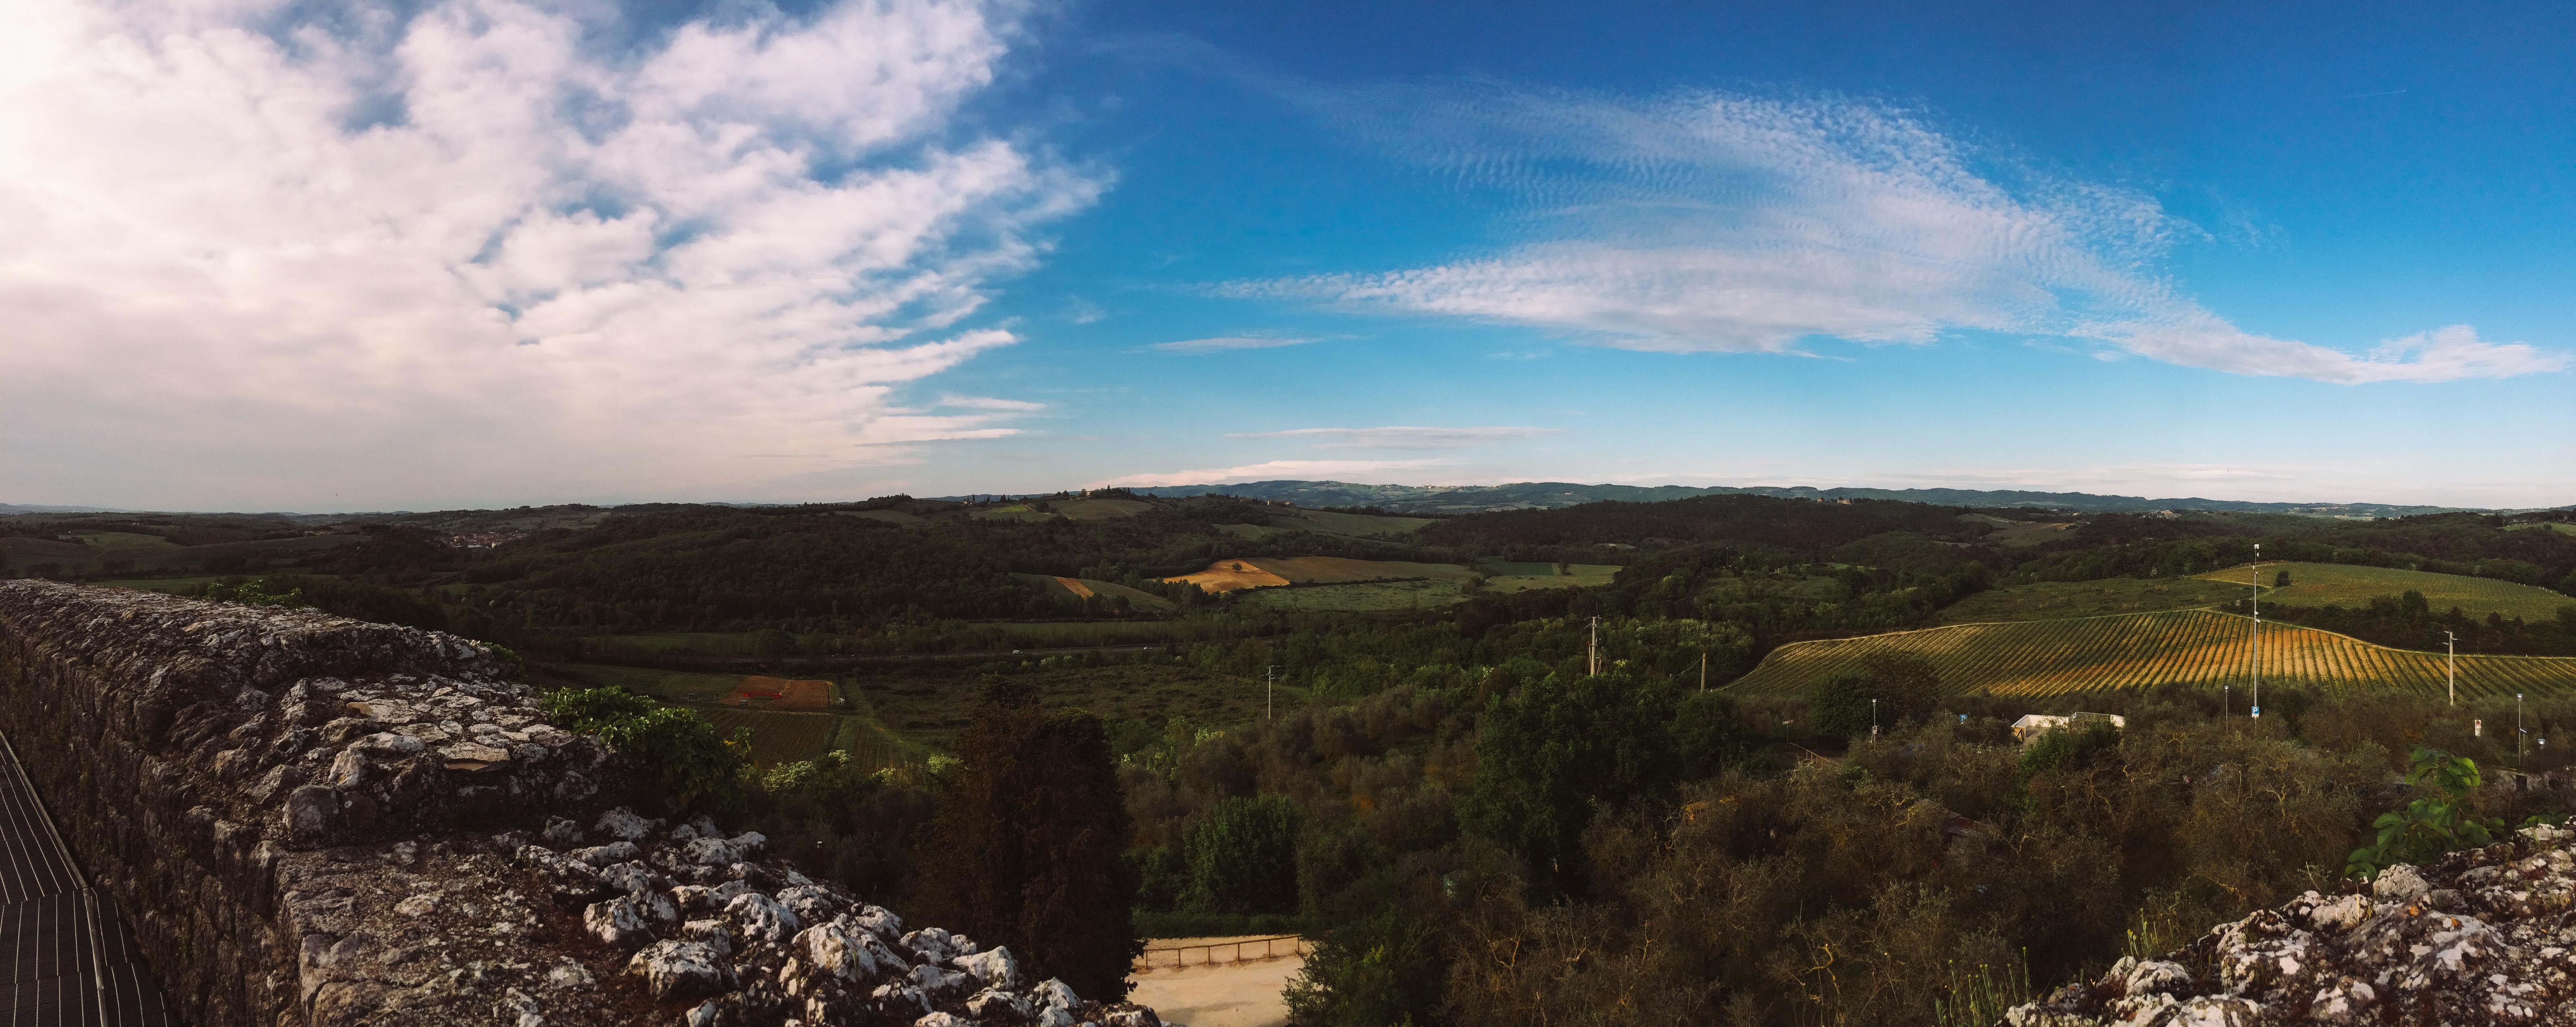 Vista dos campos Toscanos.